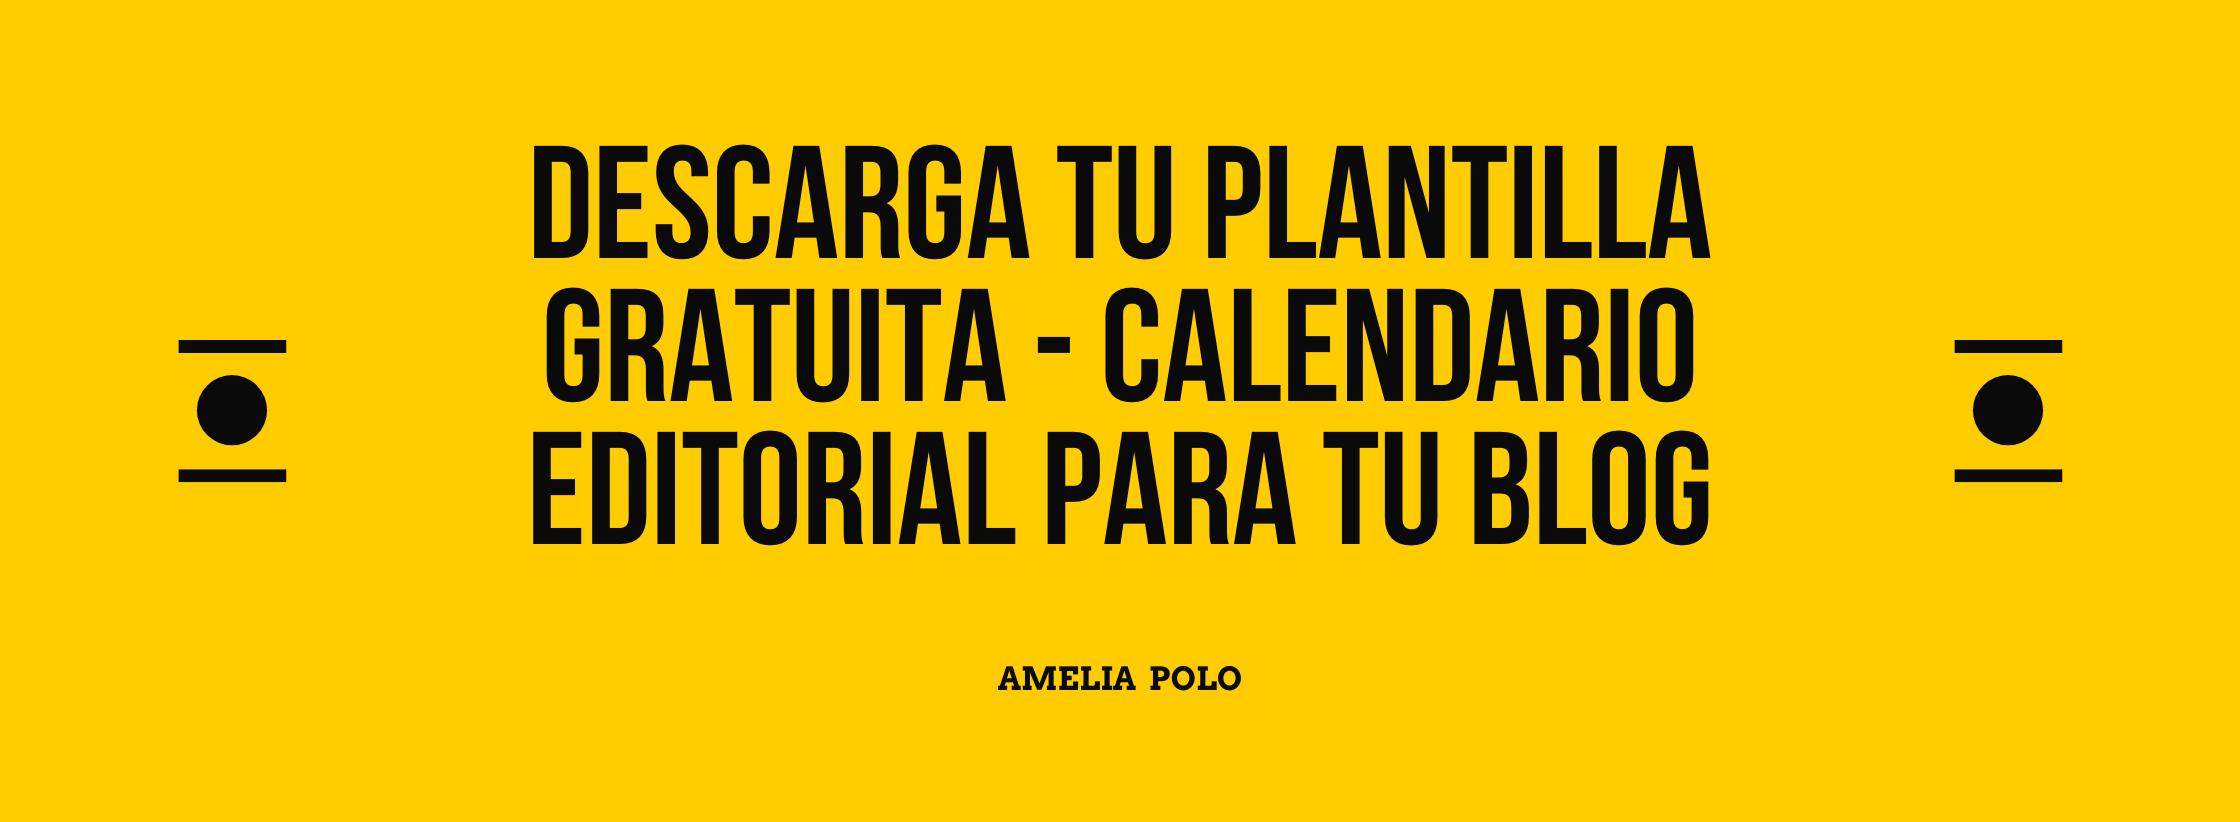 descarga tu plantilla gratuita - calendario editorial para tu blog